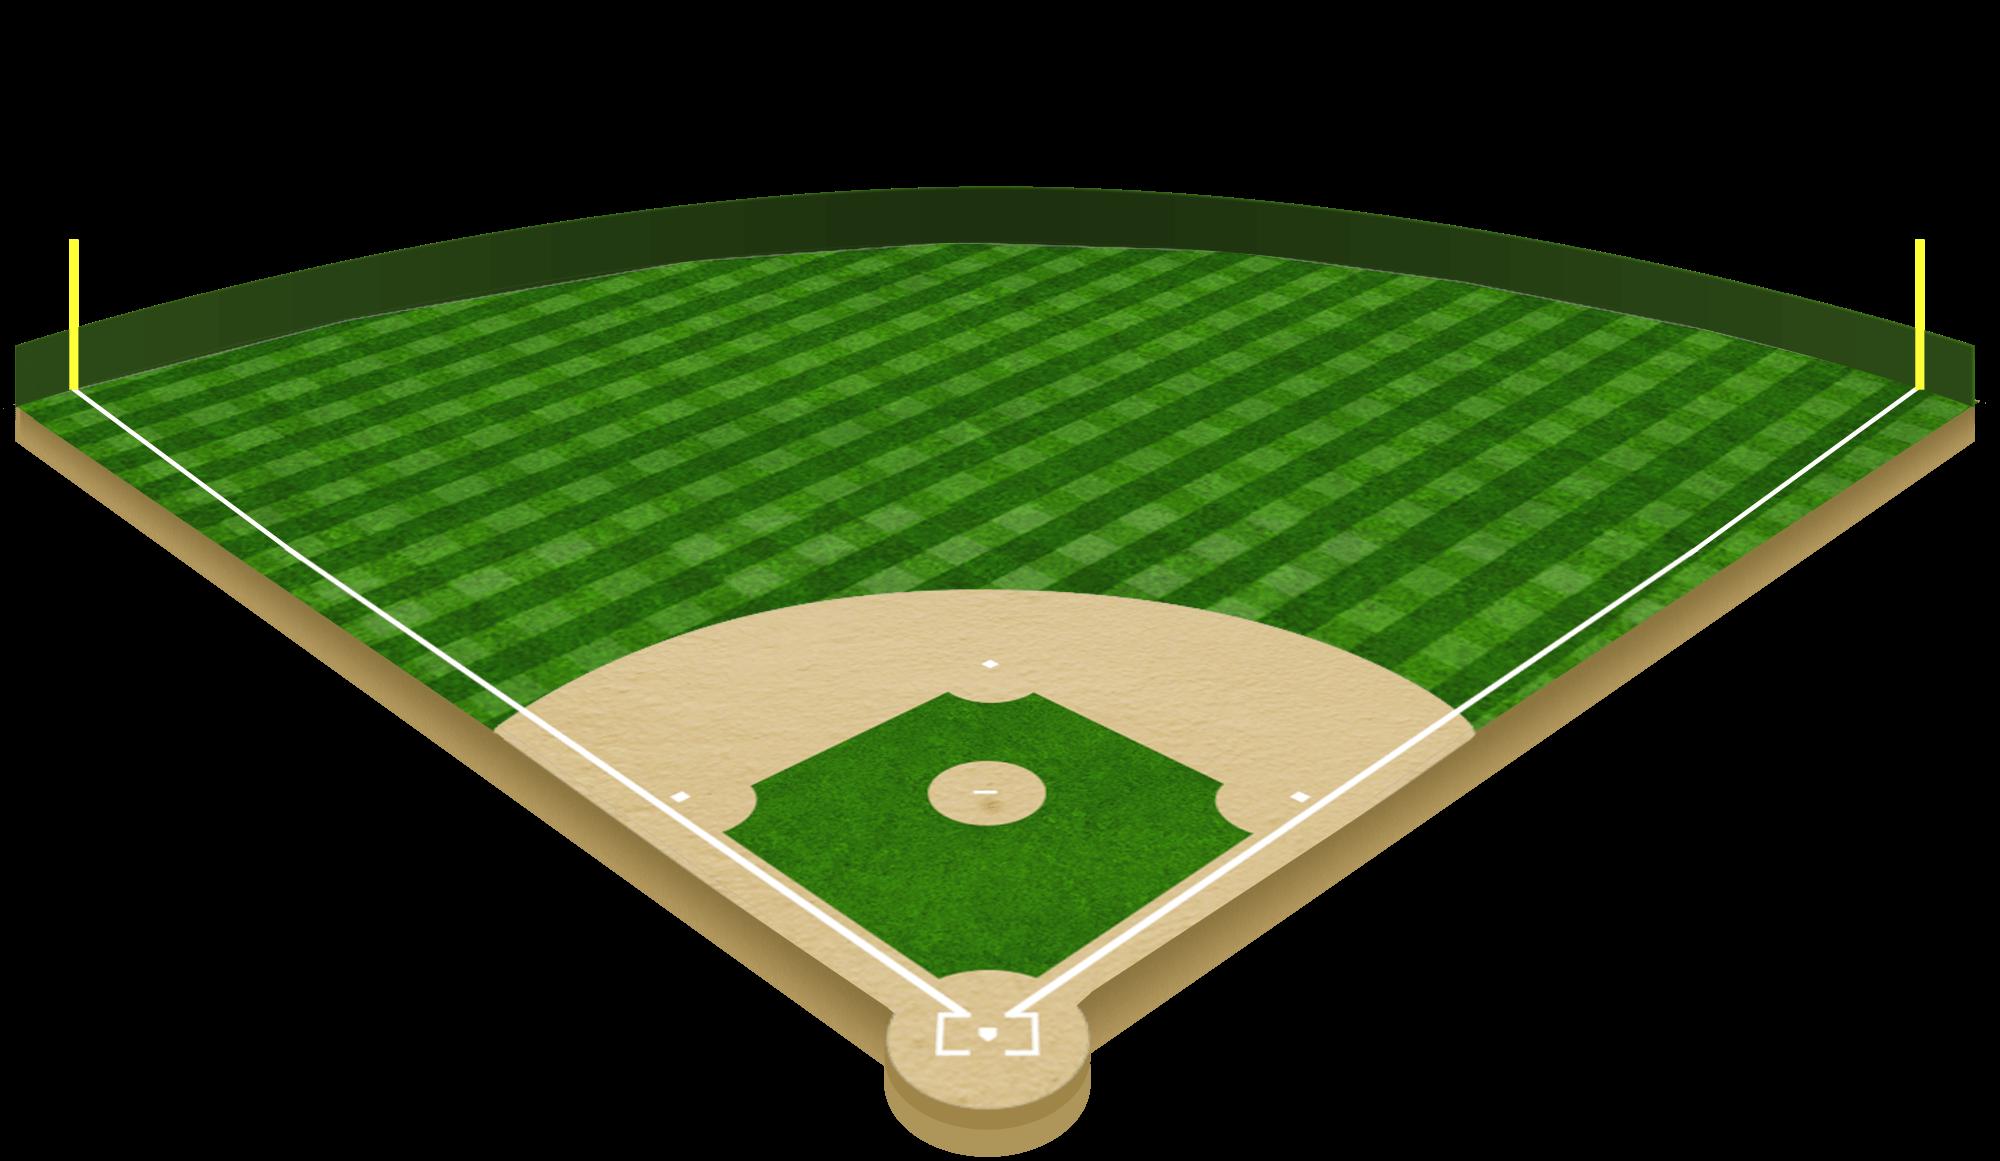 Court clipart field. Baseball rug diamond gallery